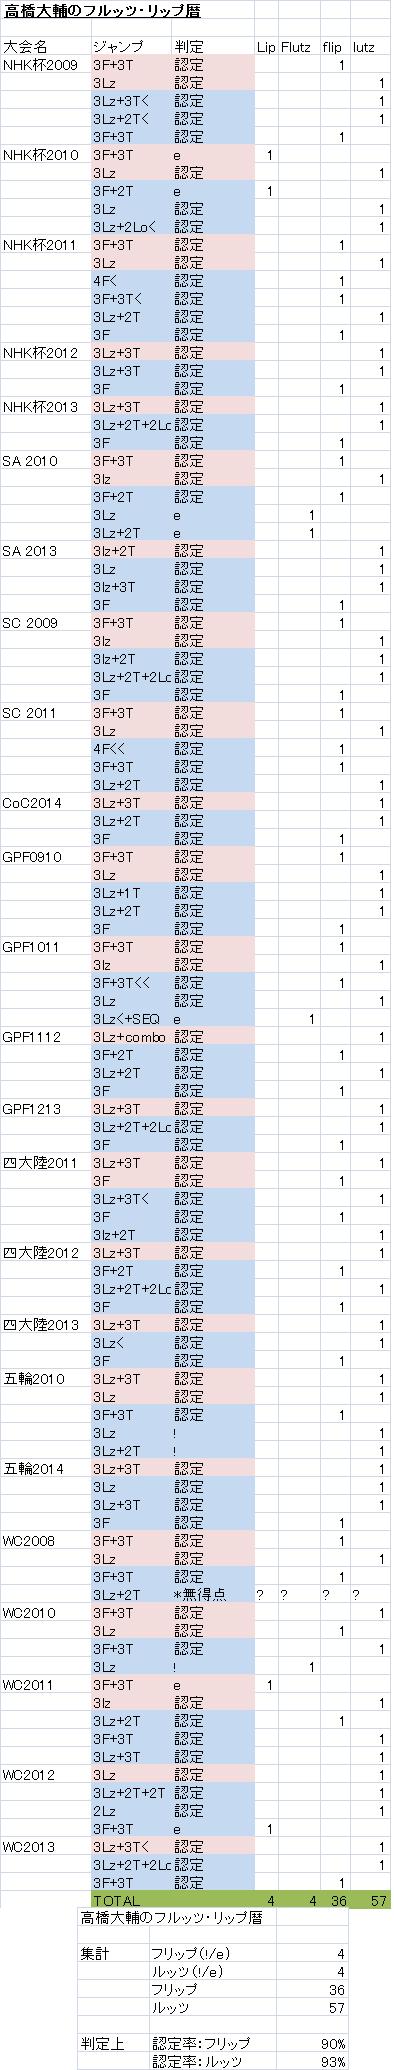 daisuke-takahashi-edge-calls-stats.png